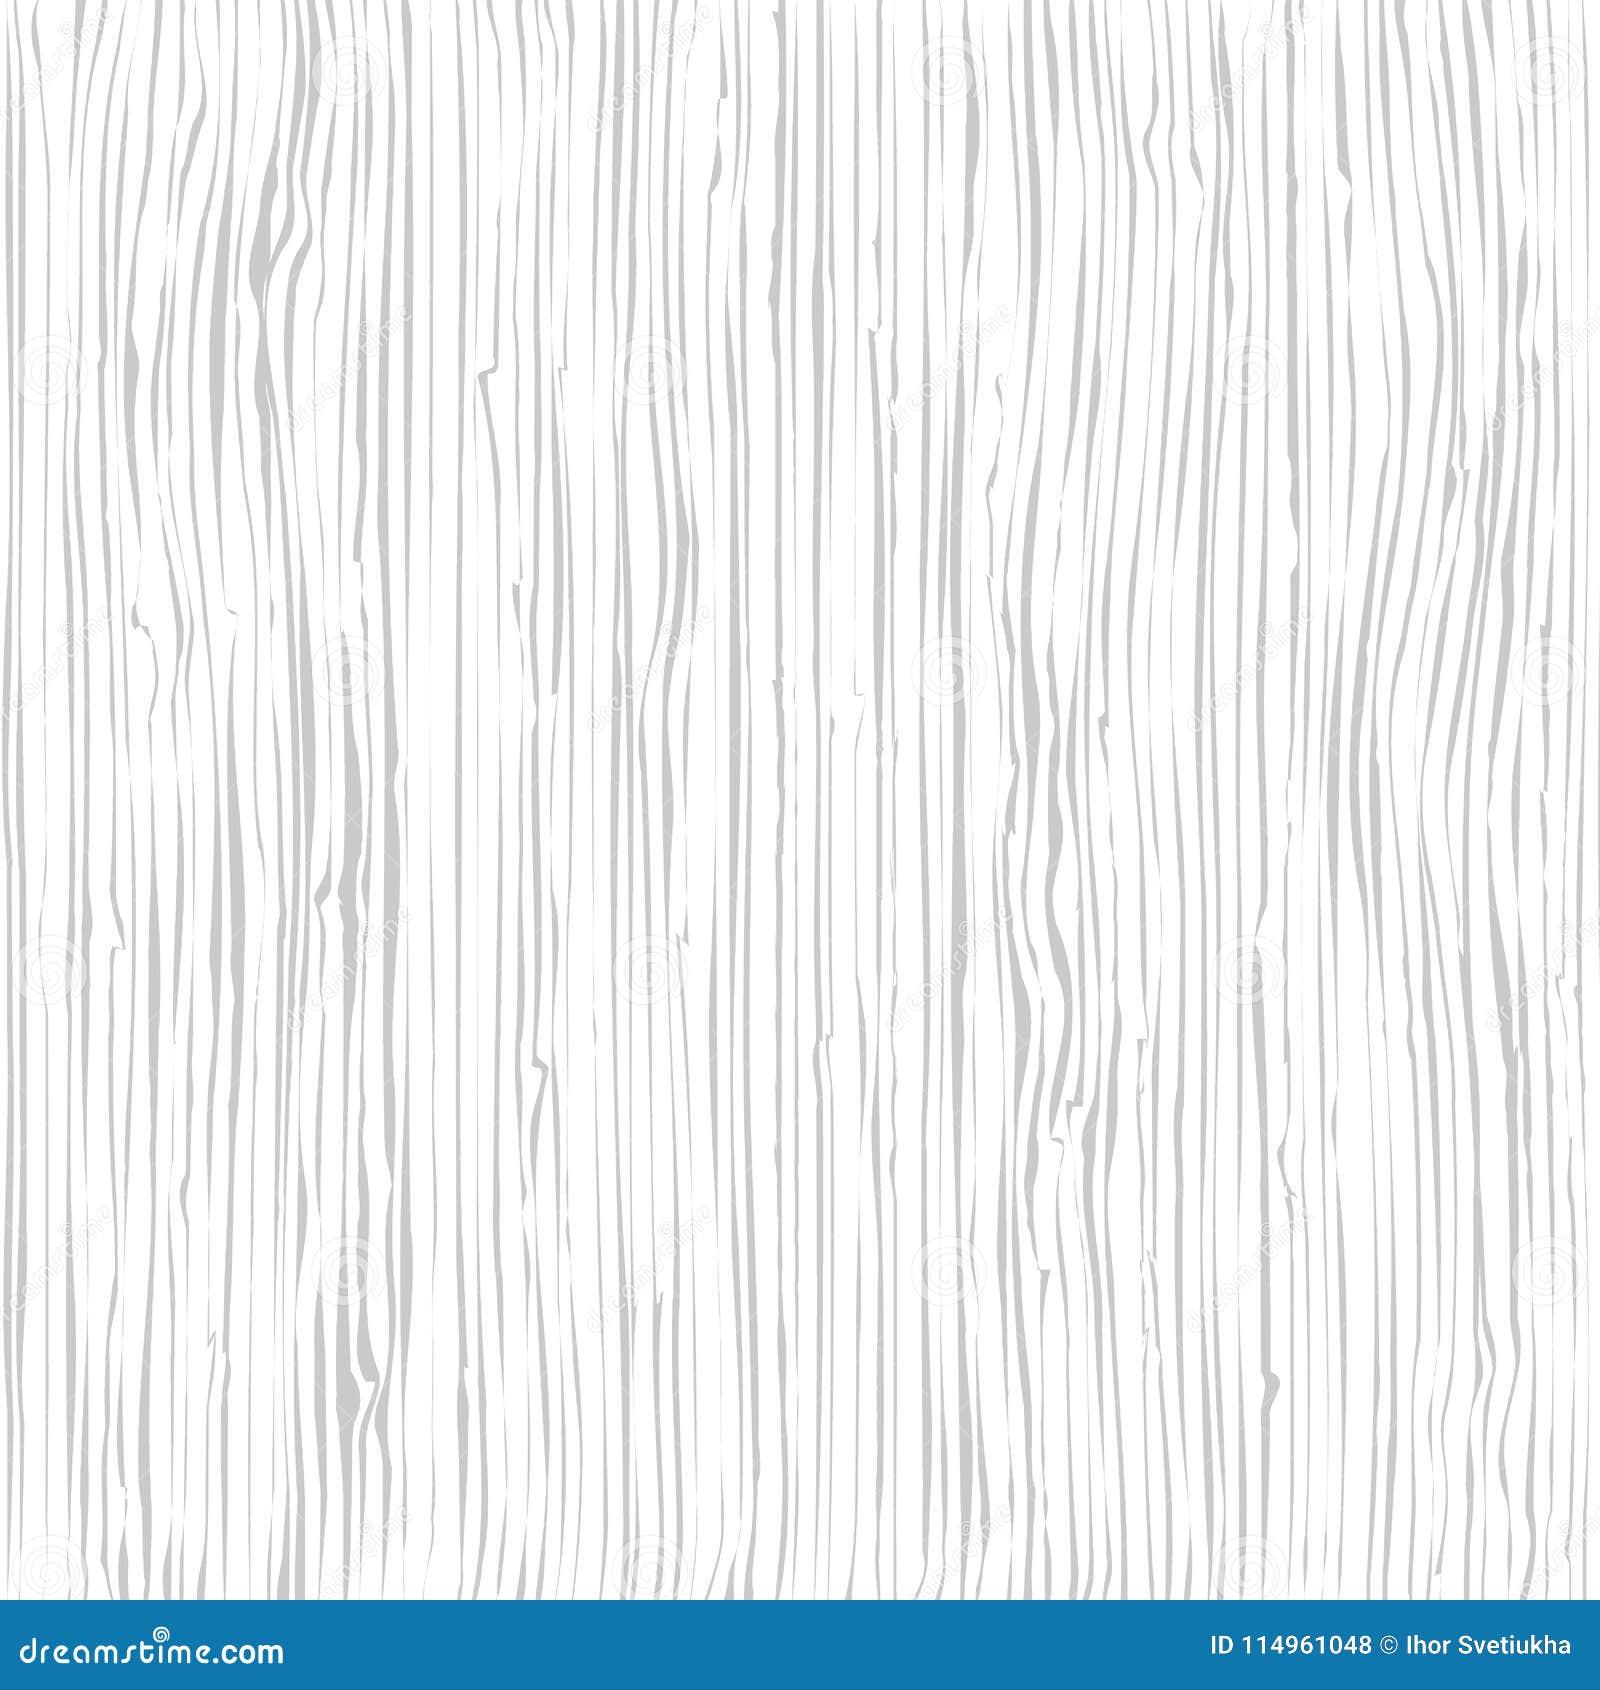 Wooden Texture Wood Grain Pattern Fibers Structure Background Vector Illustration Stock Vector Illustration Of Dense Line 114961048